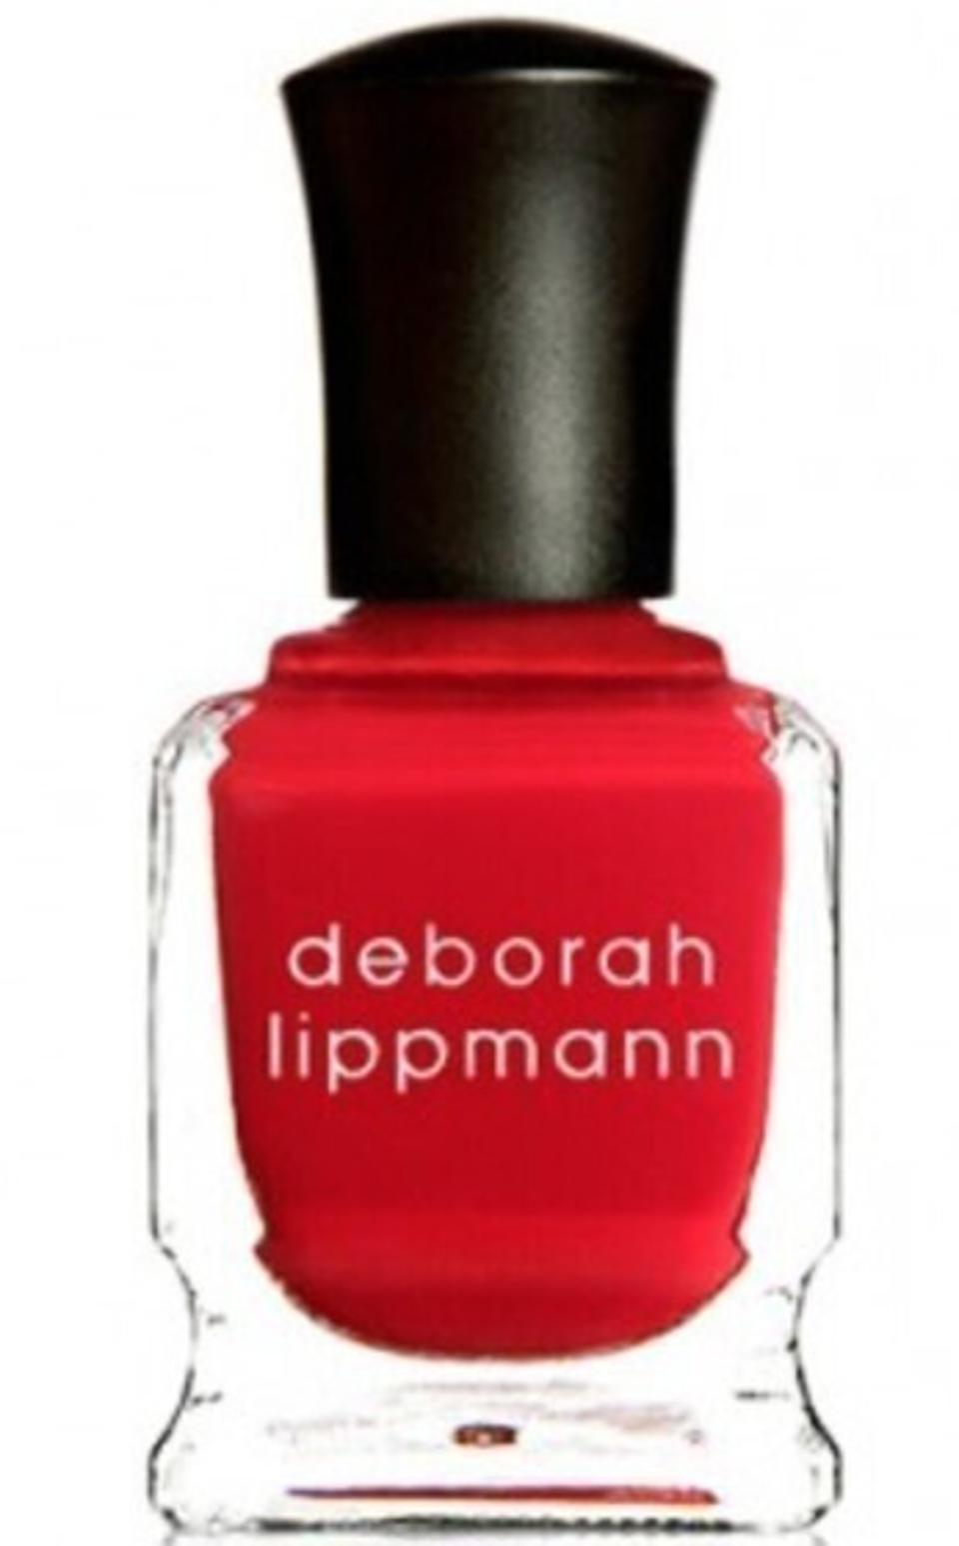 Deborah-Lippmann-Nail-Lacquer